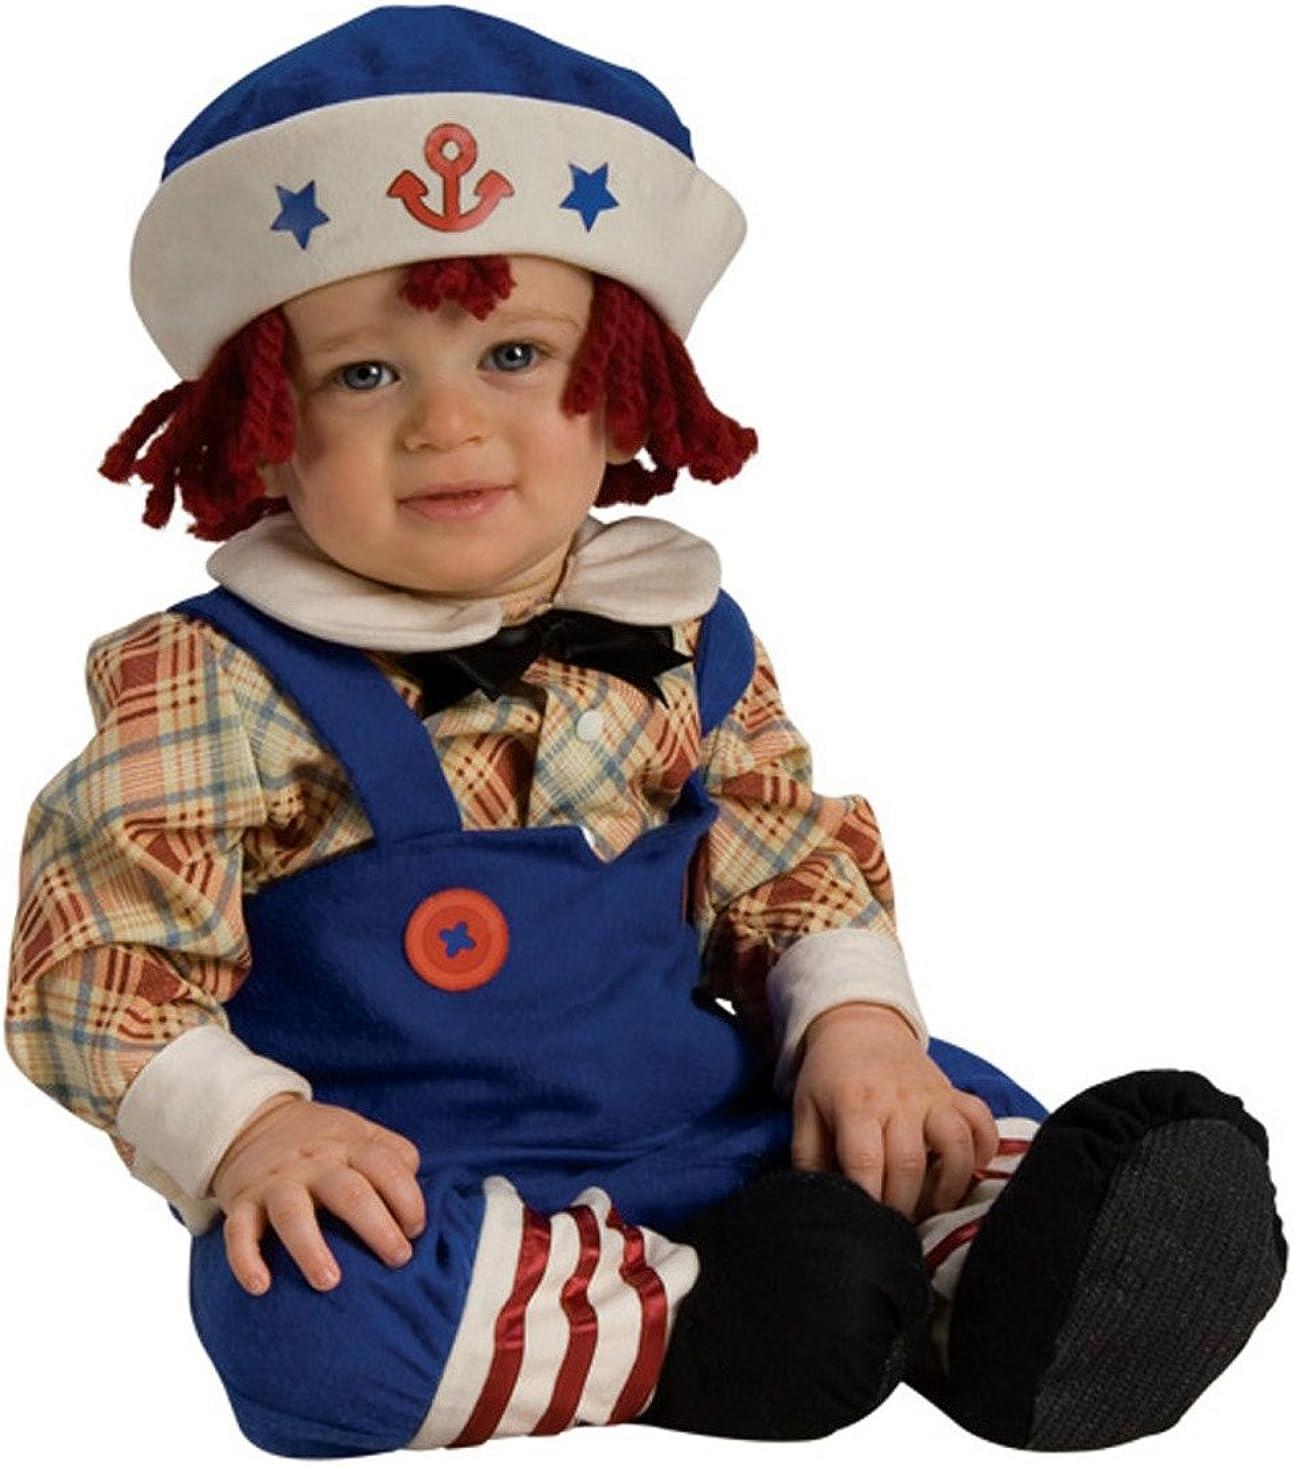 Yarn Super intense SALE Babies Max 52% OFF Ragamuffin Sailor Toddler Costume Infant